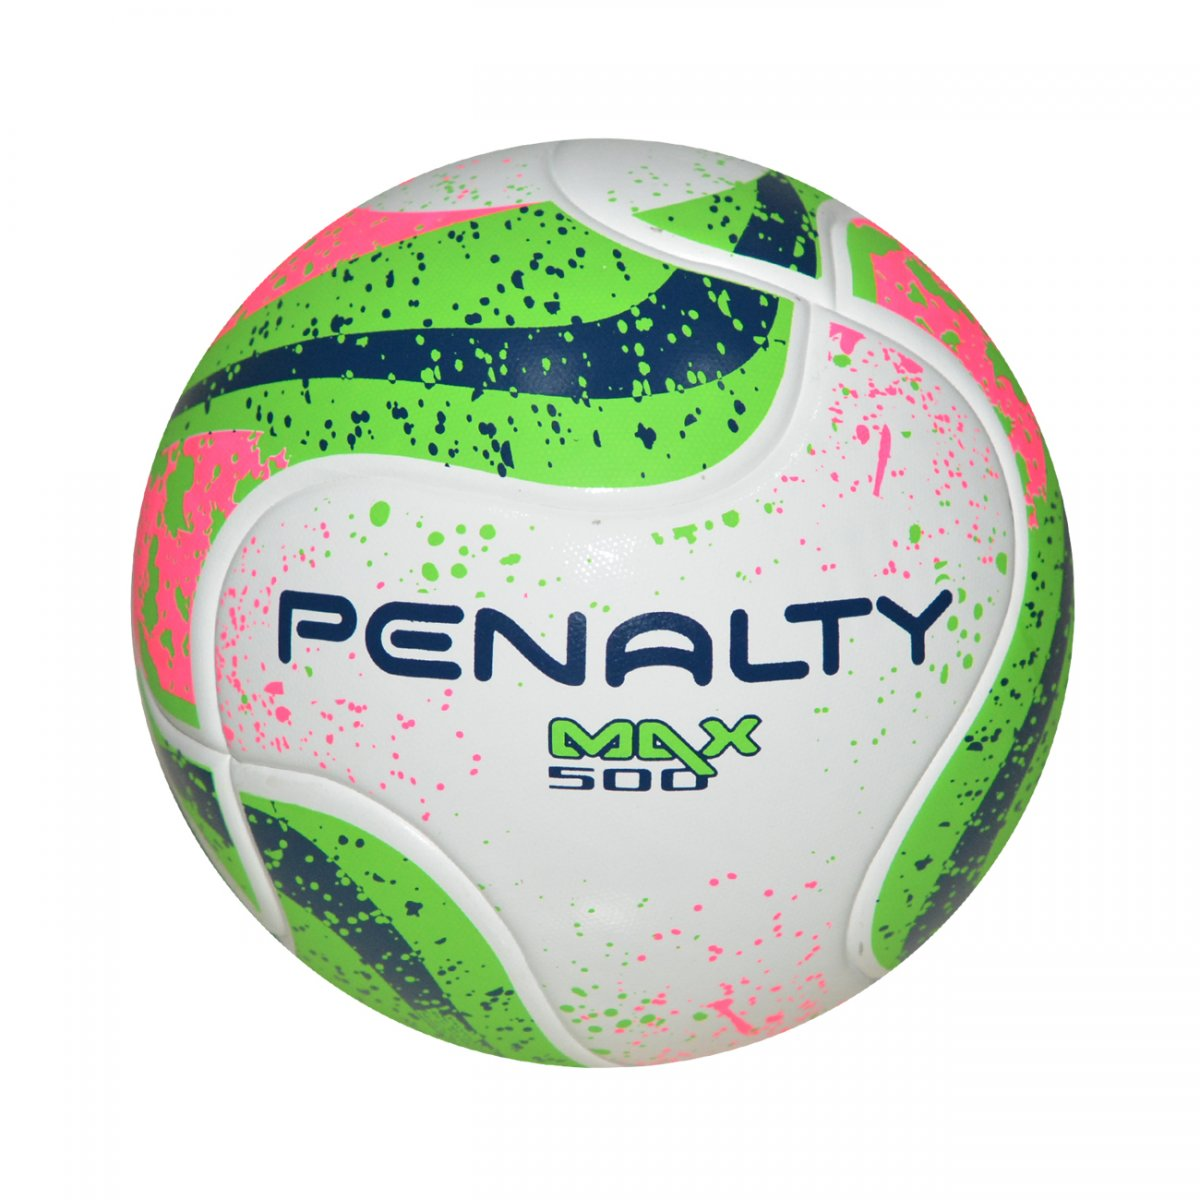 b9ca60dbed Bola Penalty Max 500 Term VII Futsal 5414421541 - Branco verde rosa -  Chuteira Nike